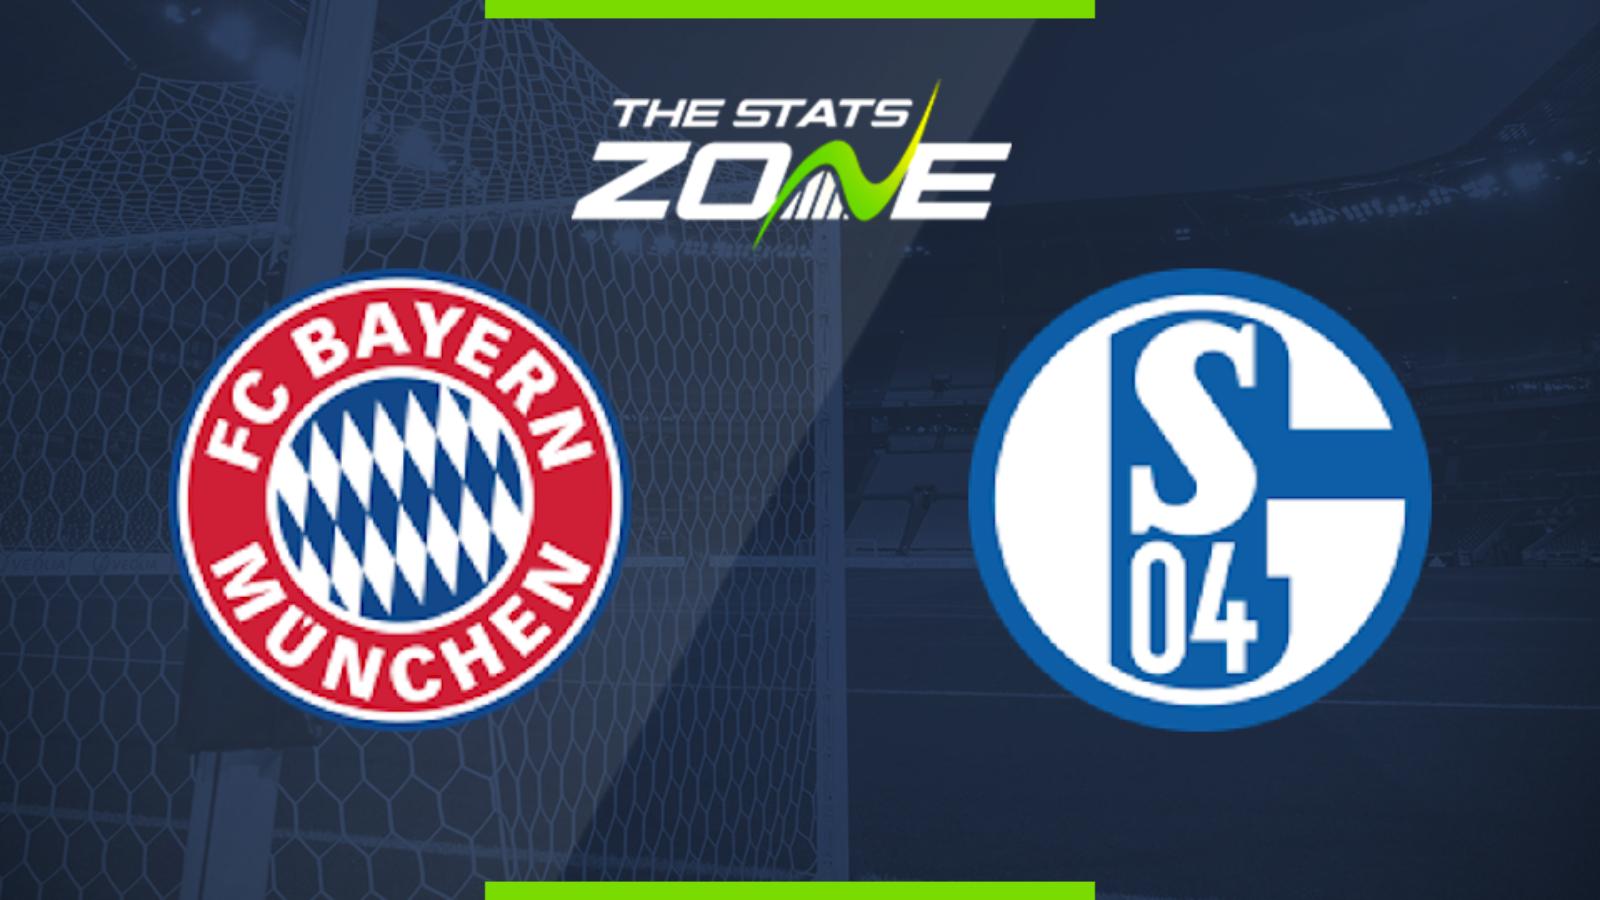 Schalke 04 Vs Bayern MГјnchen